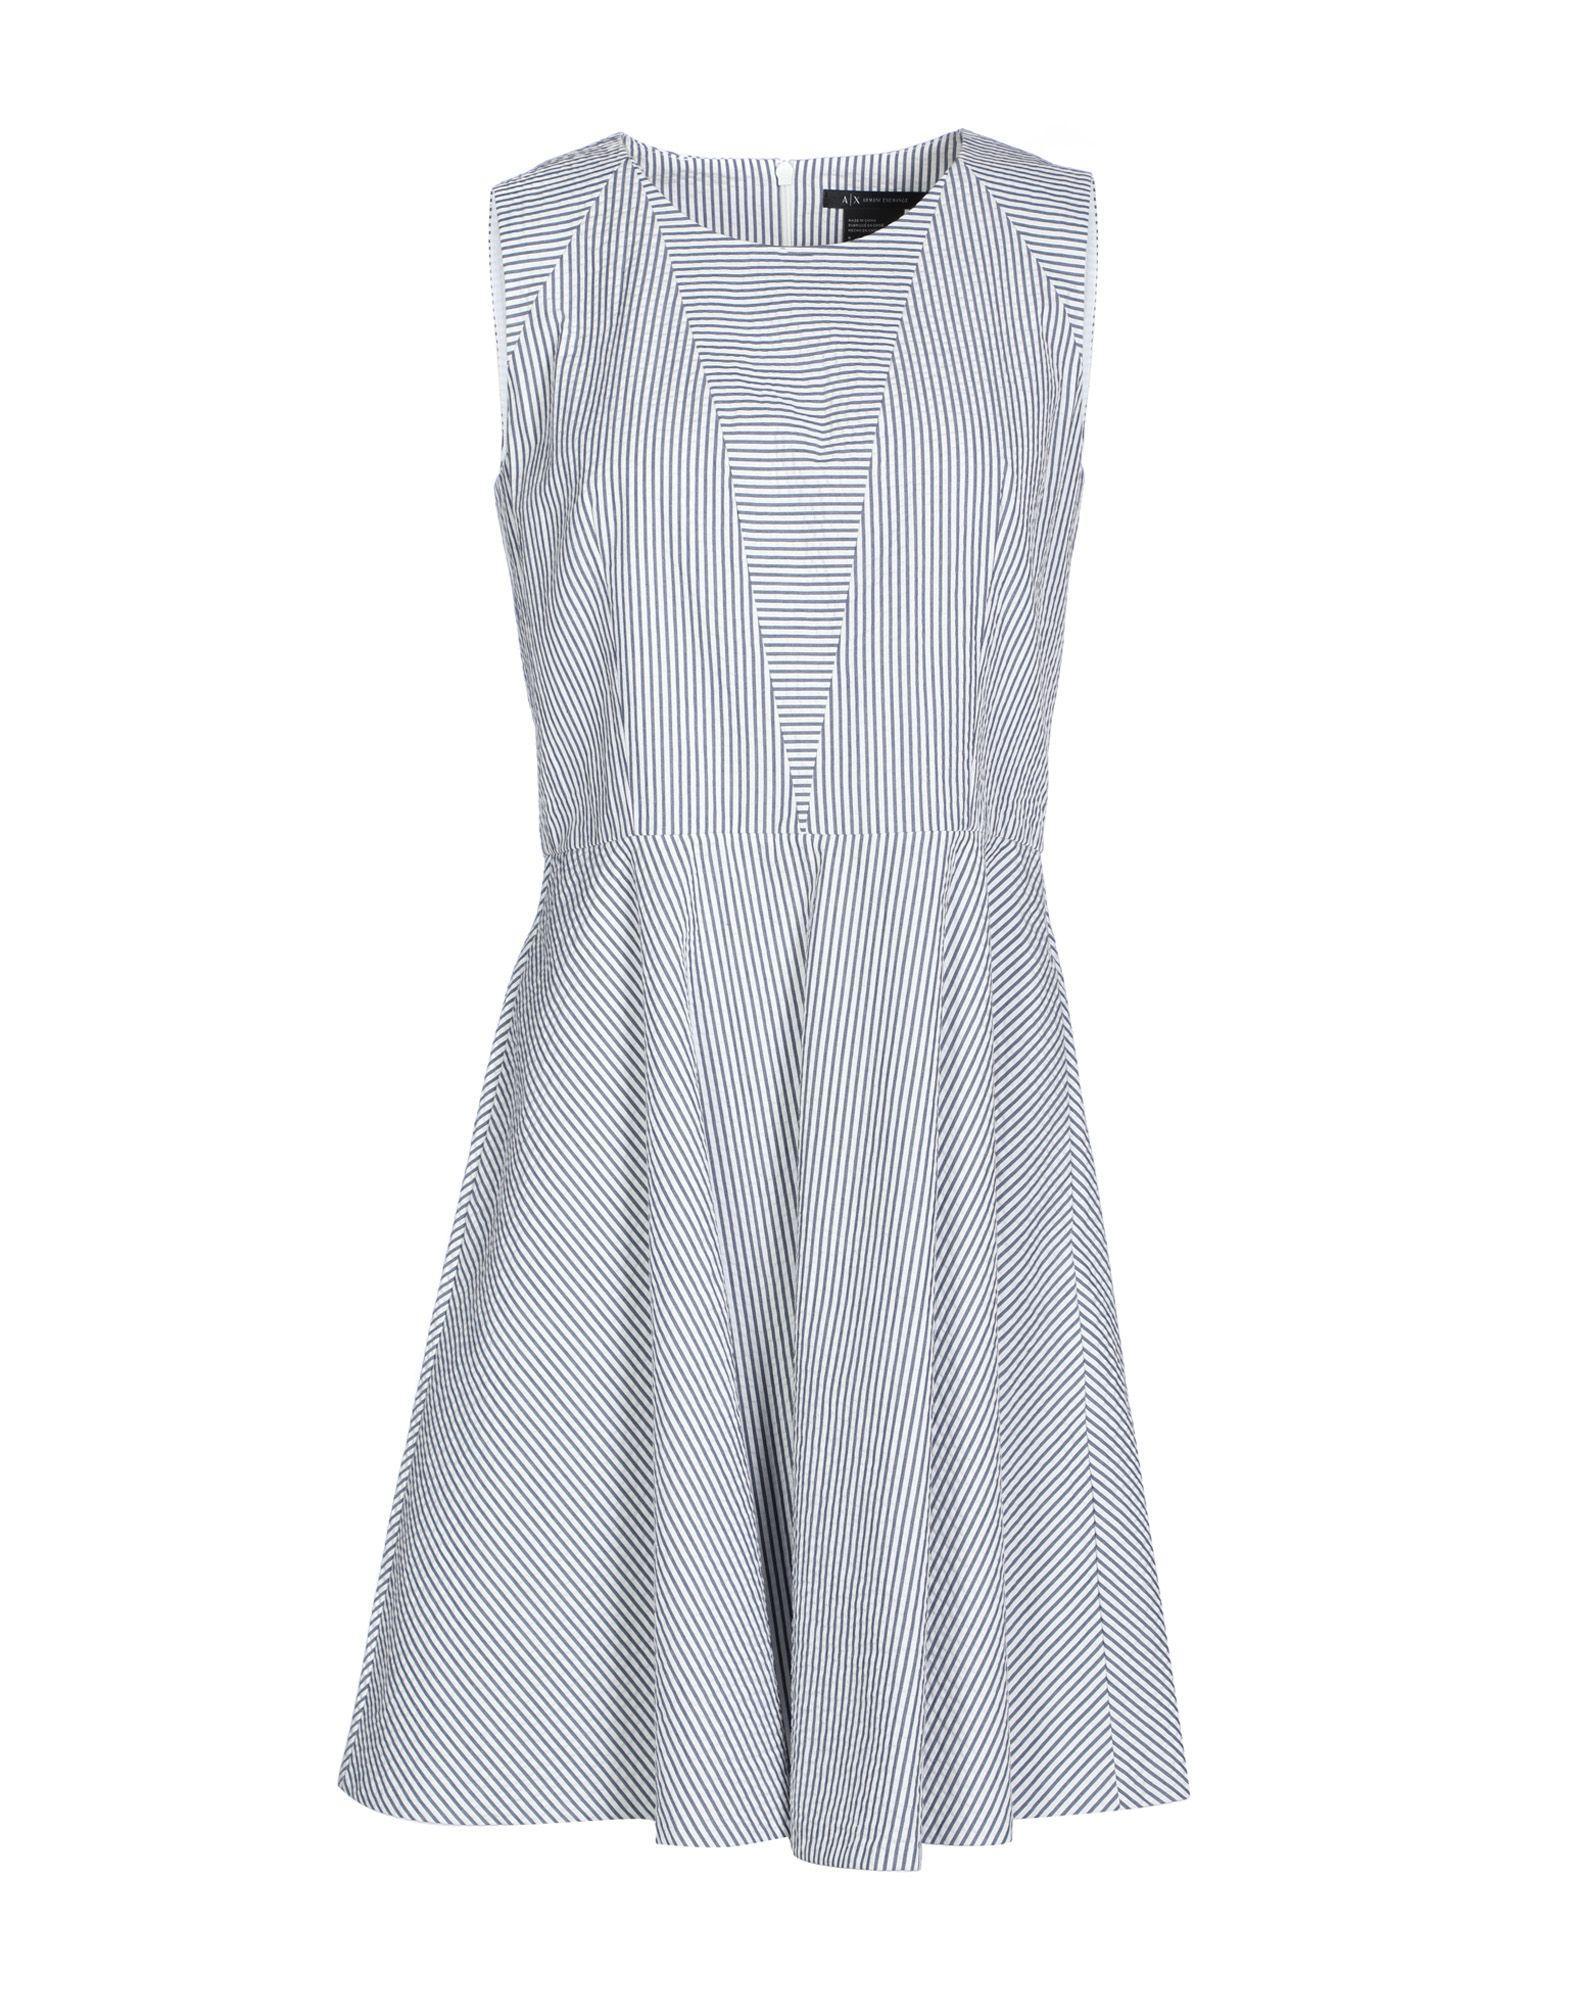 Armani Exchange Short Dress In Blue